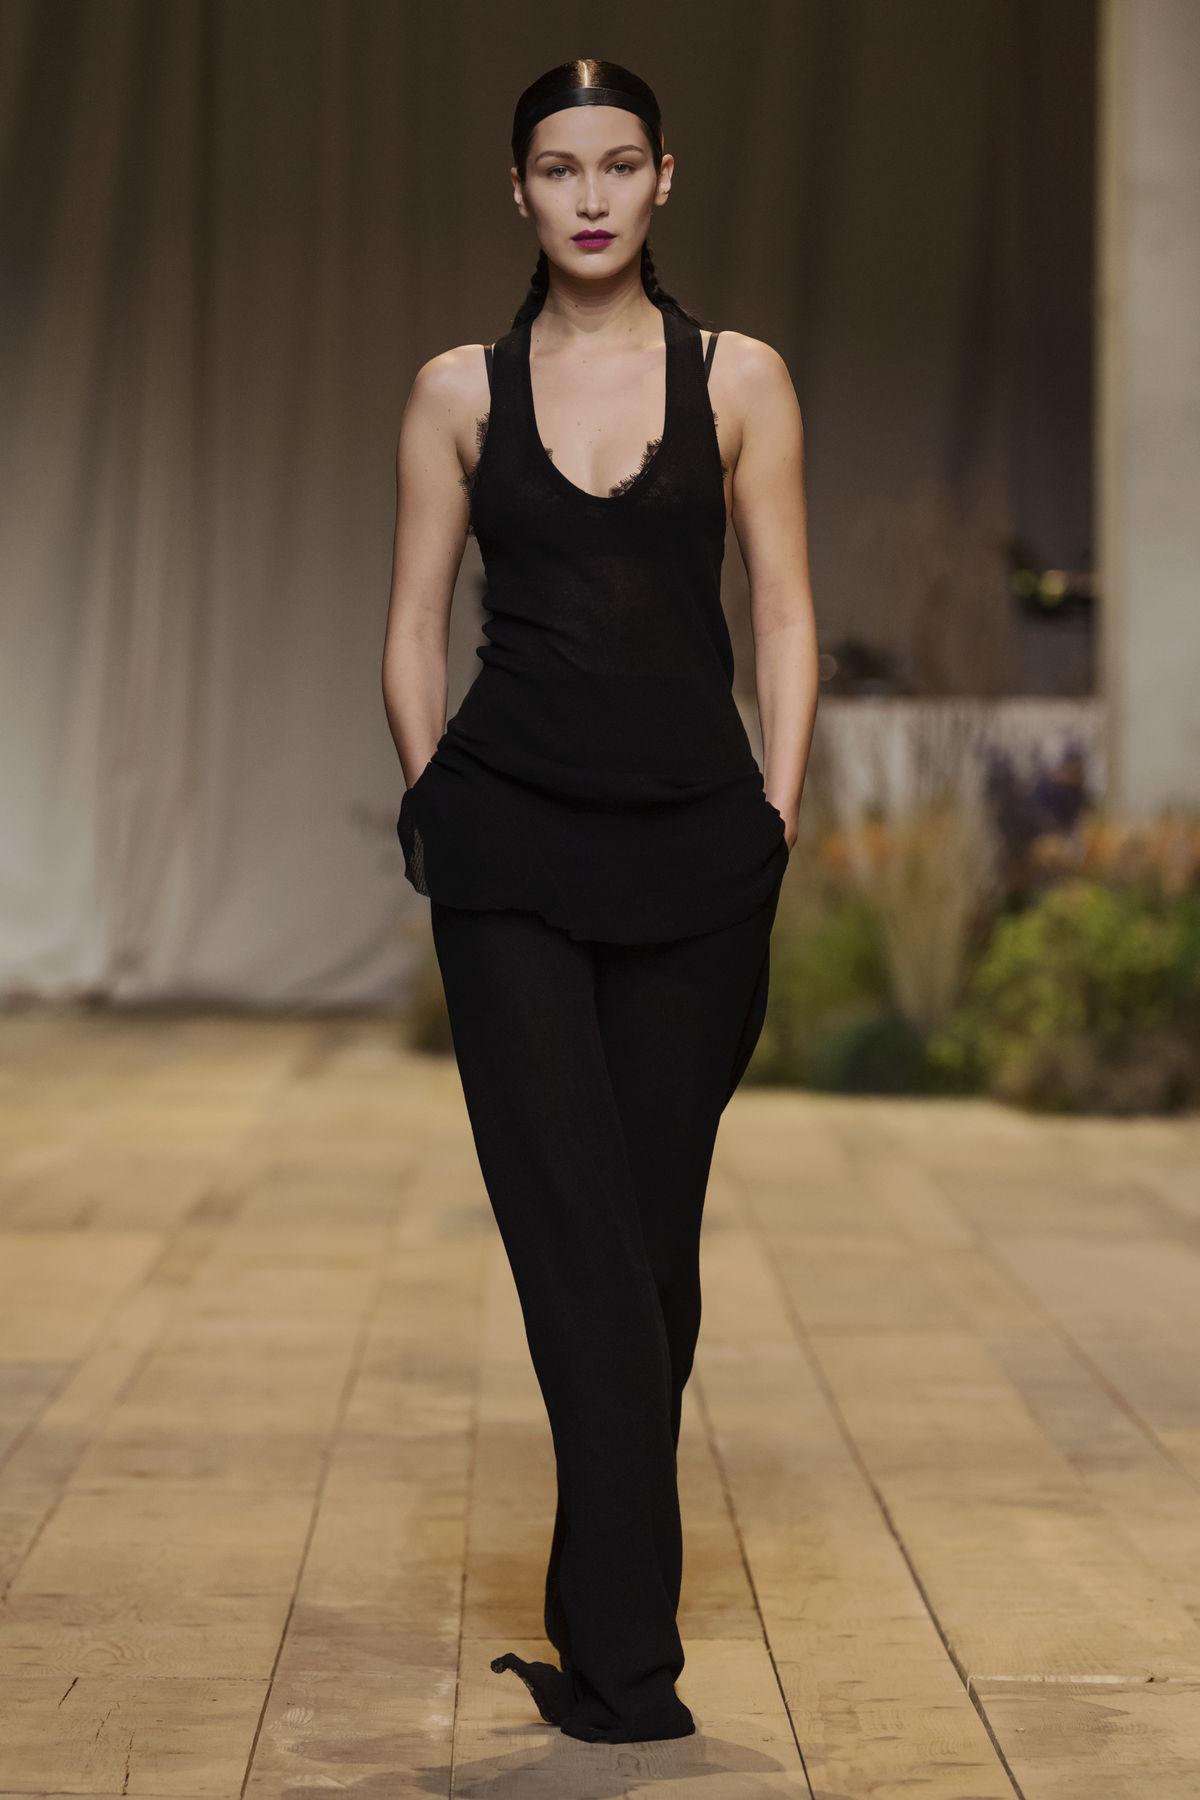 Topmodelka Bella Hadid predvádzala kolekciu H&M Studio Jar-Leto 2017.